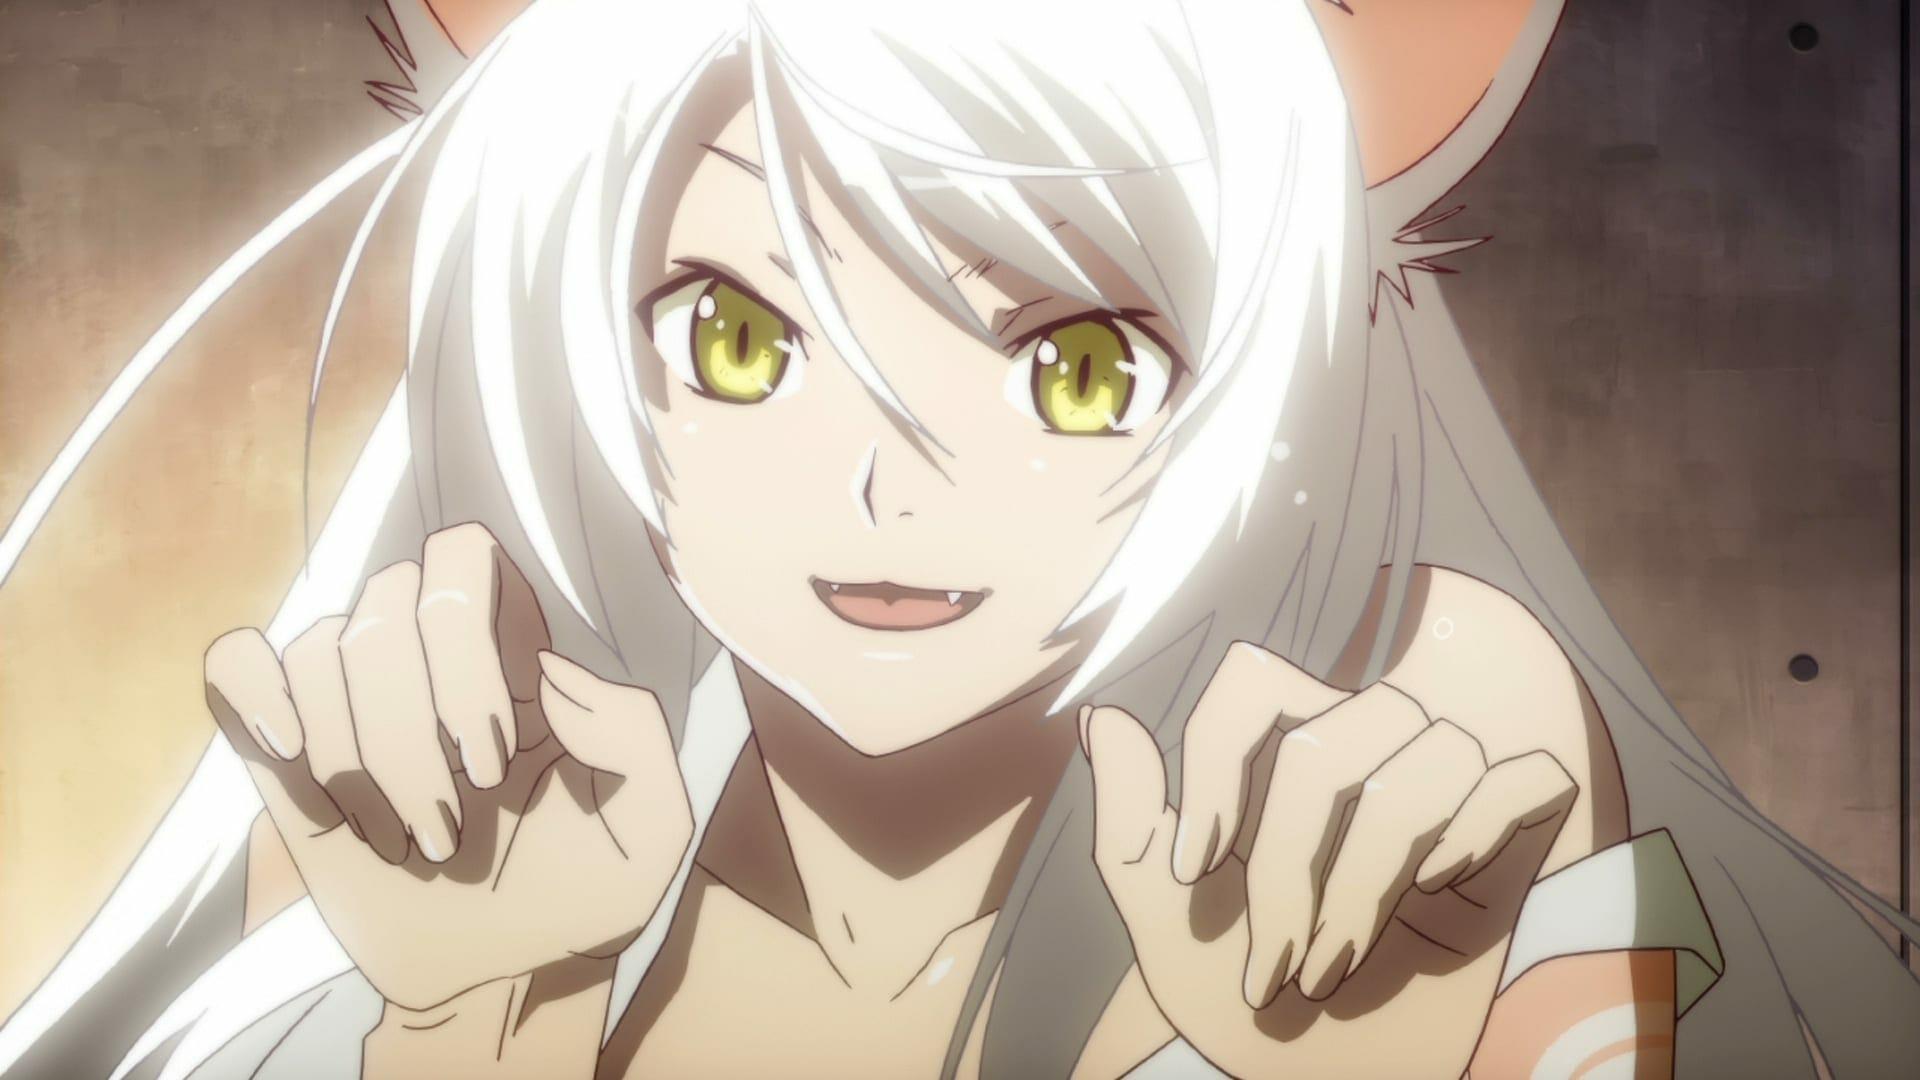 Nekomonogatari screenshot